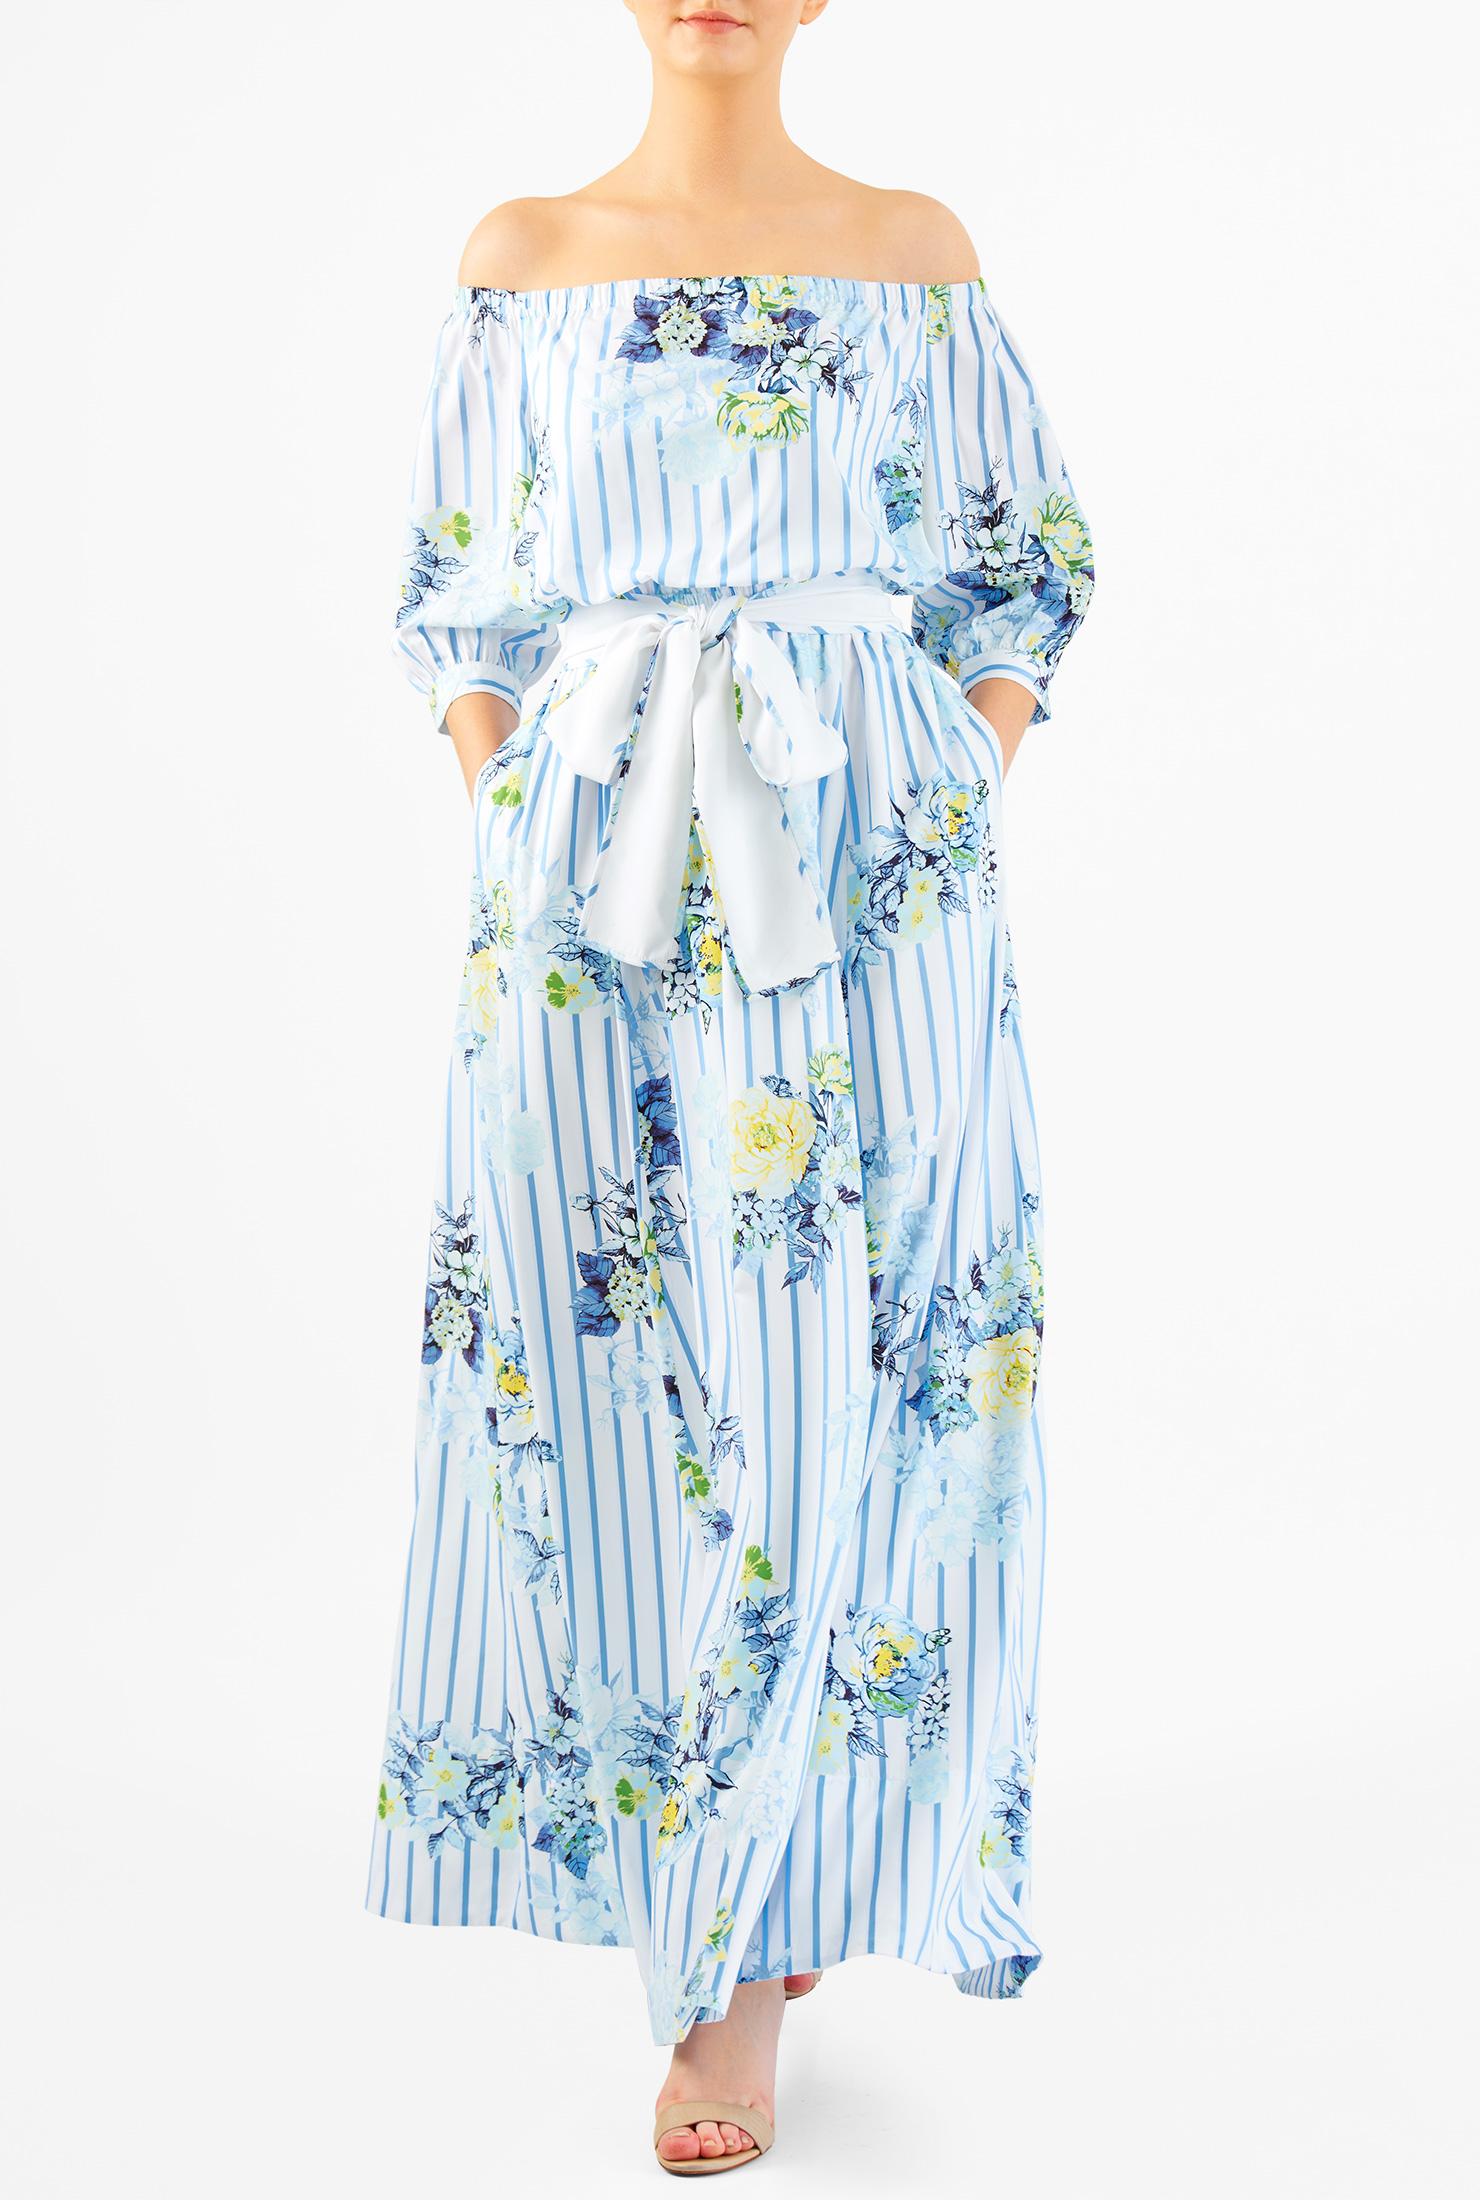 480202b0f222 Women s Fashion Clothing 0-36W and Custom